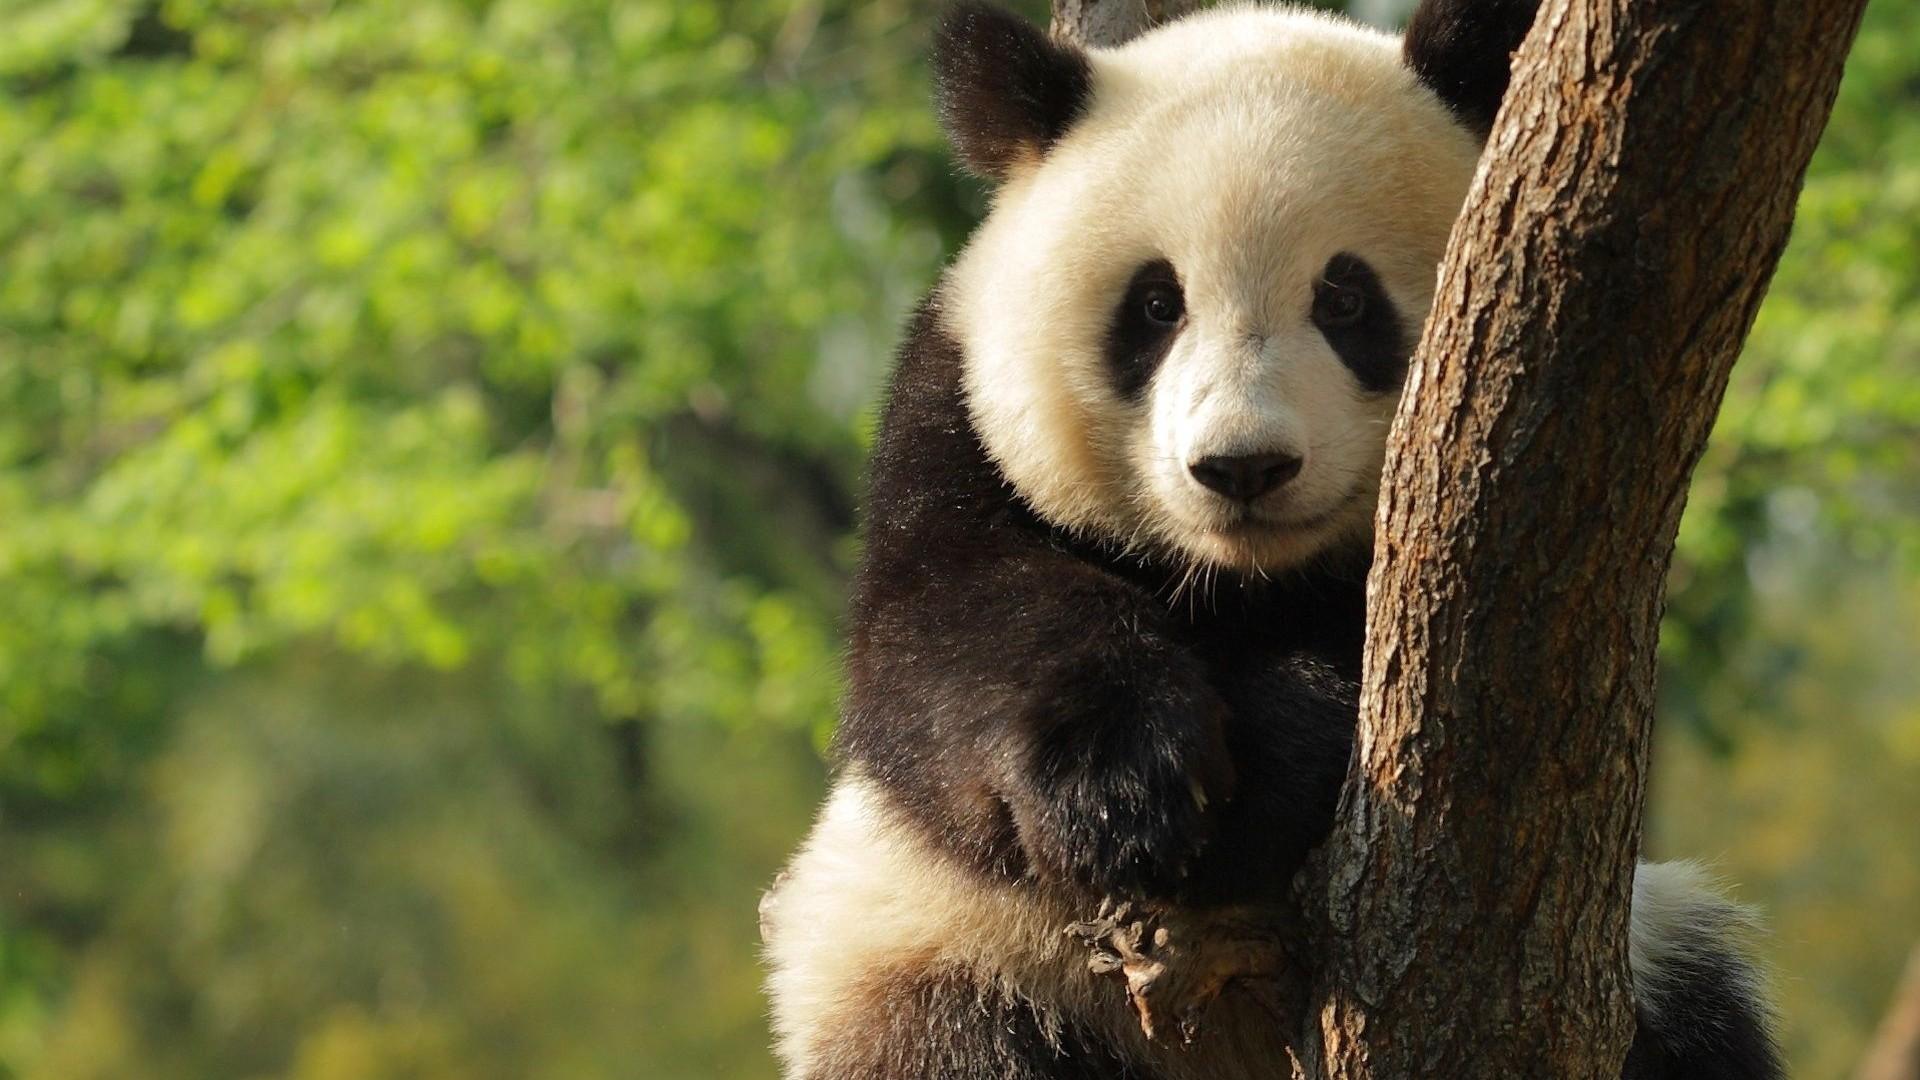 Giant Panda HD Wallpapers Download Desktop Wallpaper Images 1920x1080